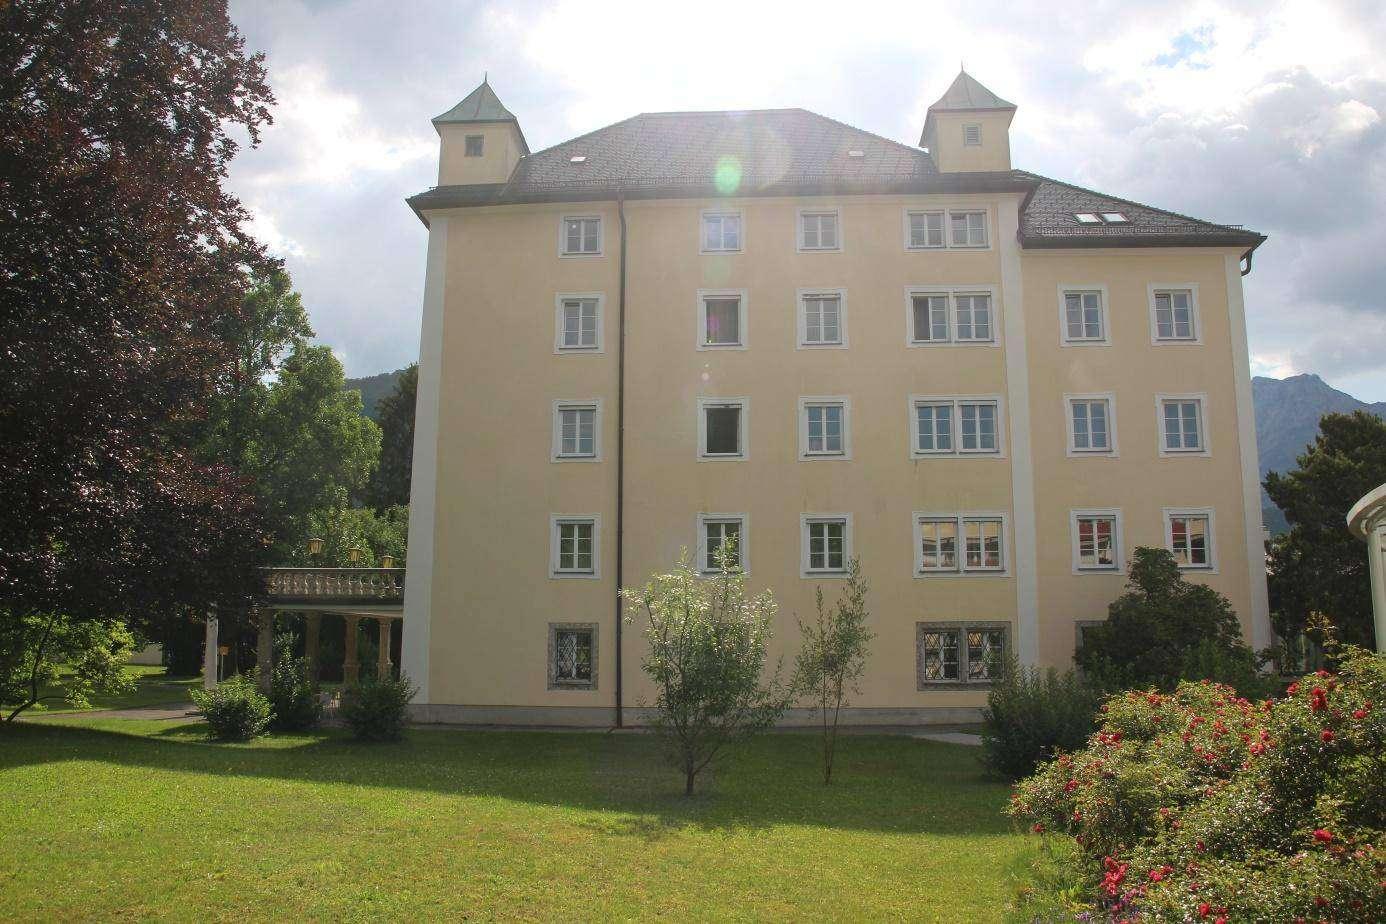 Seniorenresidenz Schloss Kahlsperg - Geschichte des Hauses